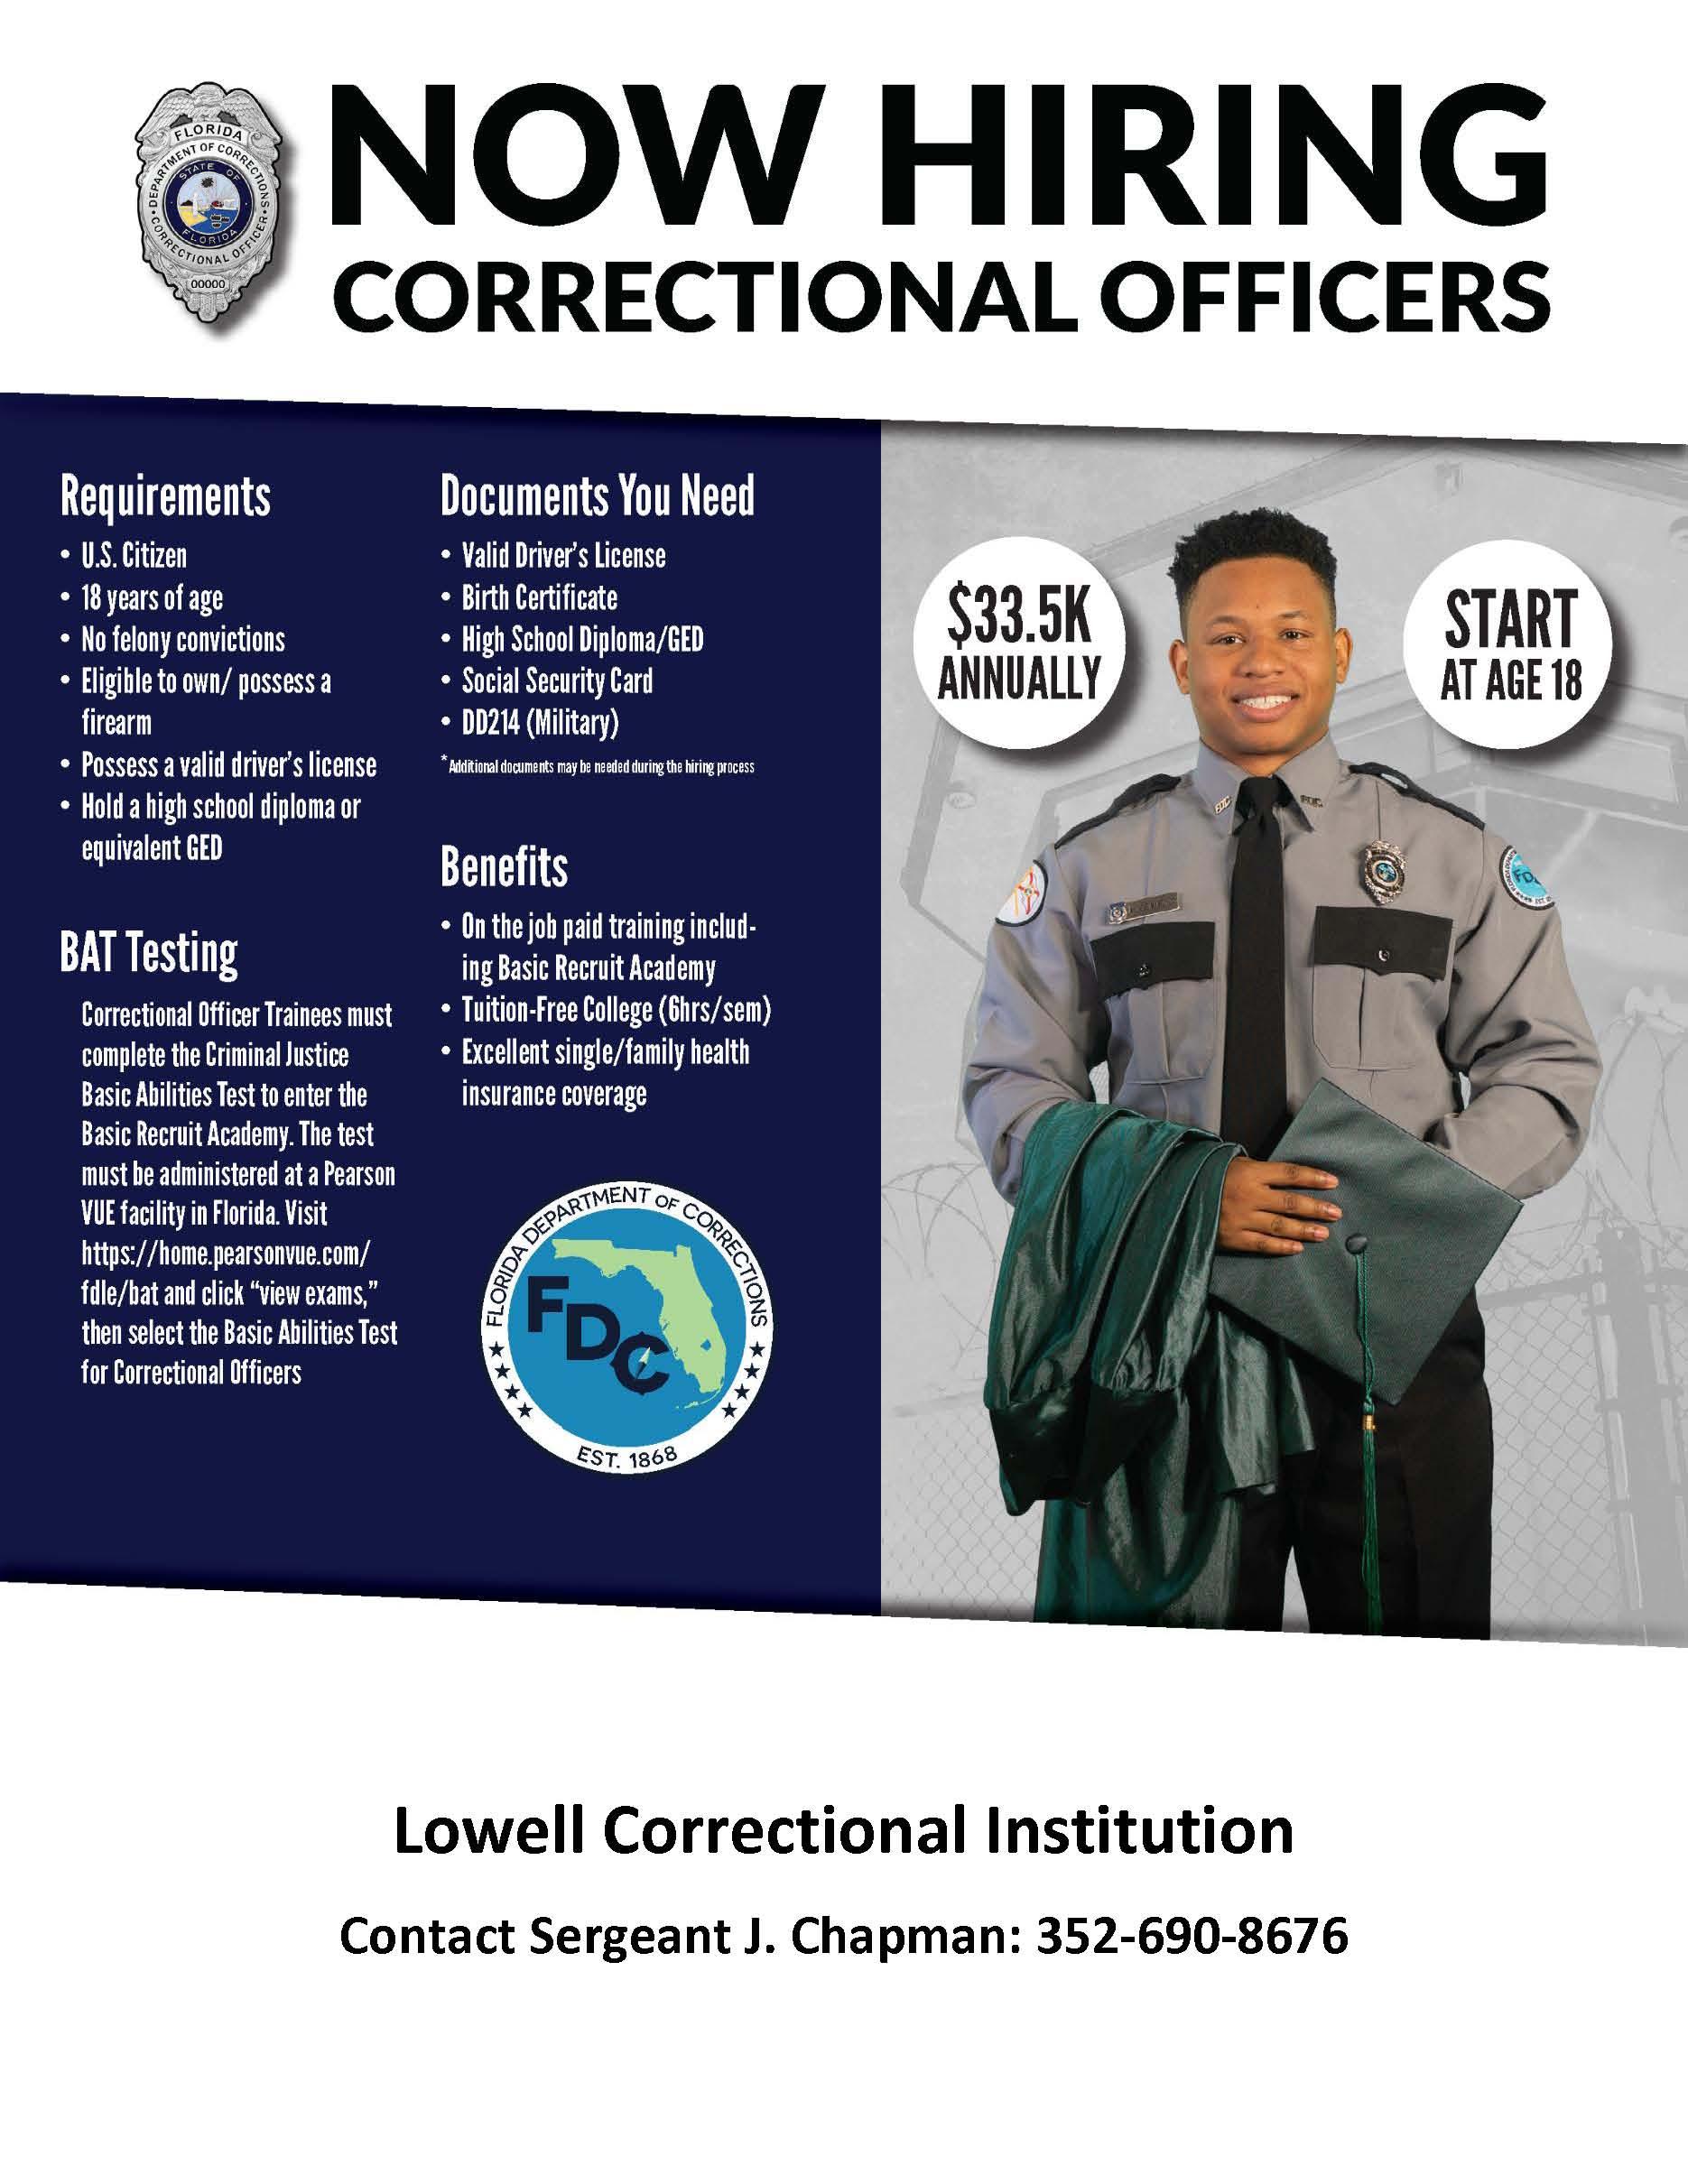 ocala post, ocala news, ocala jobs, corrections officer, lowell is hiring